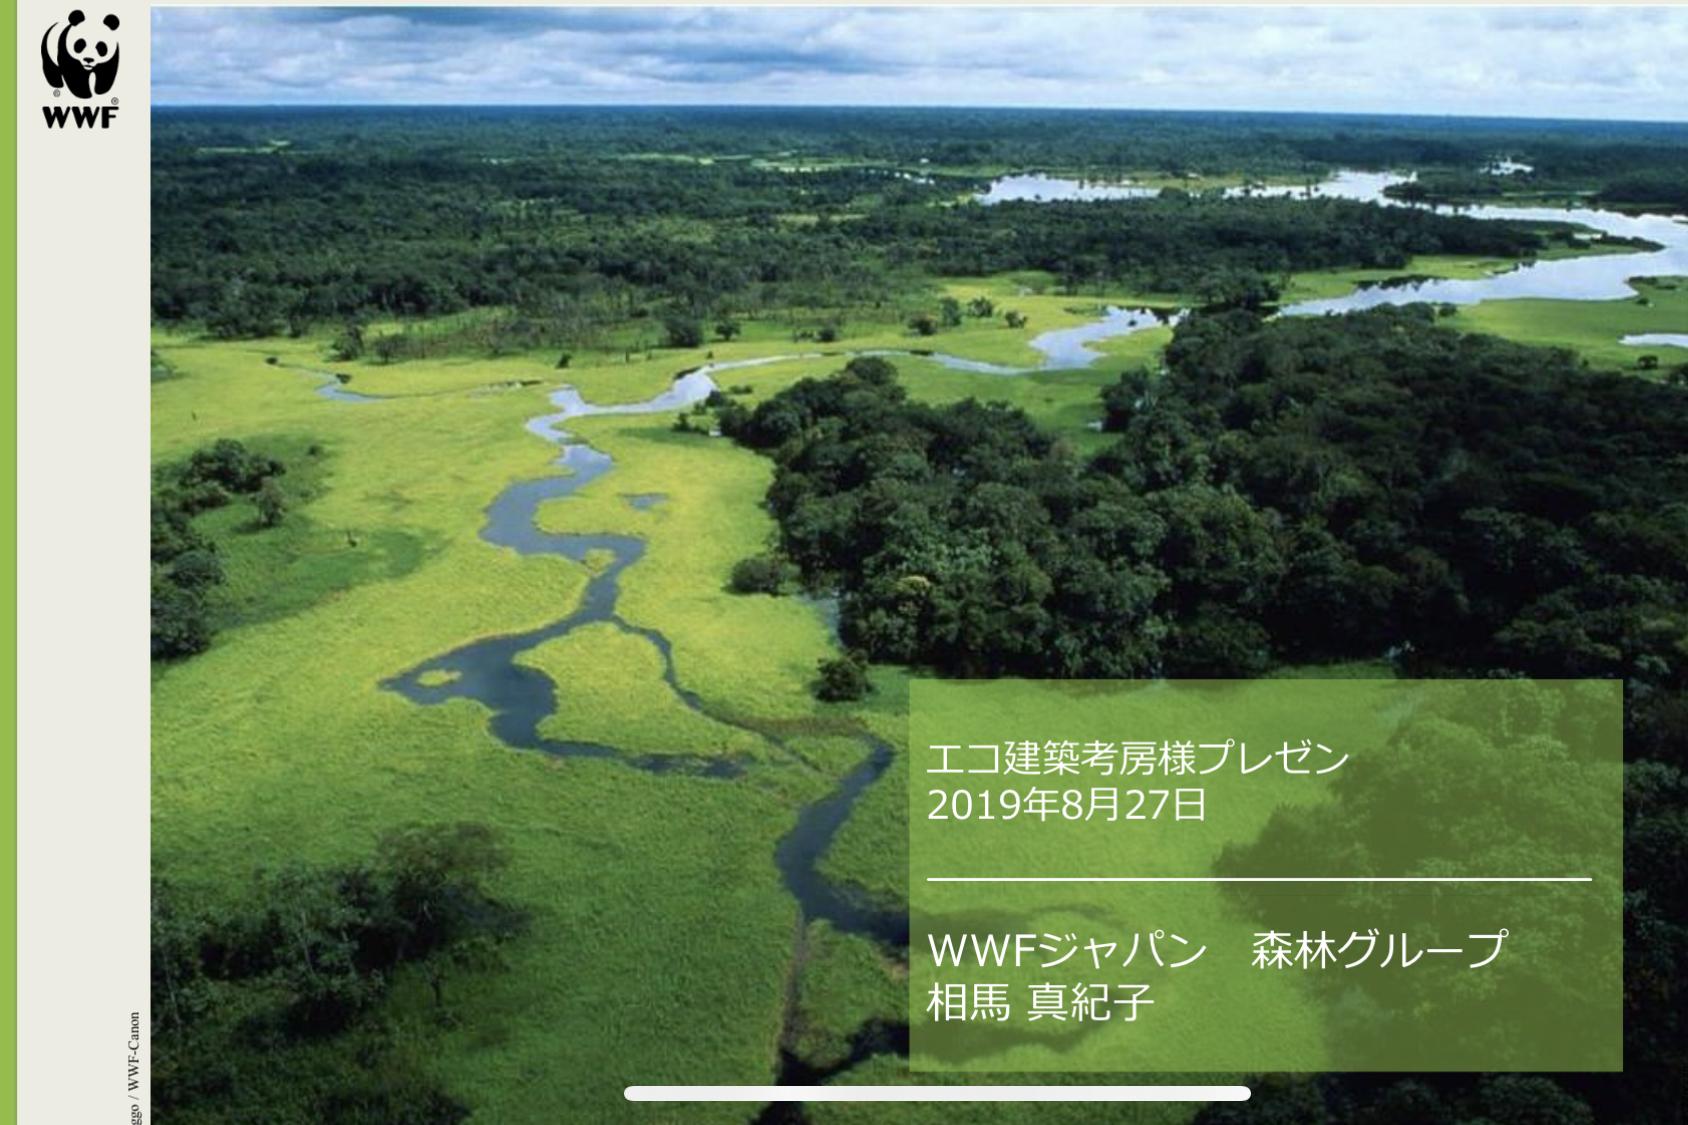 WWFJAPAN 来社☆